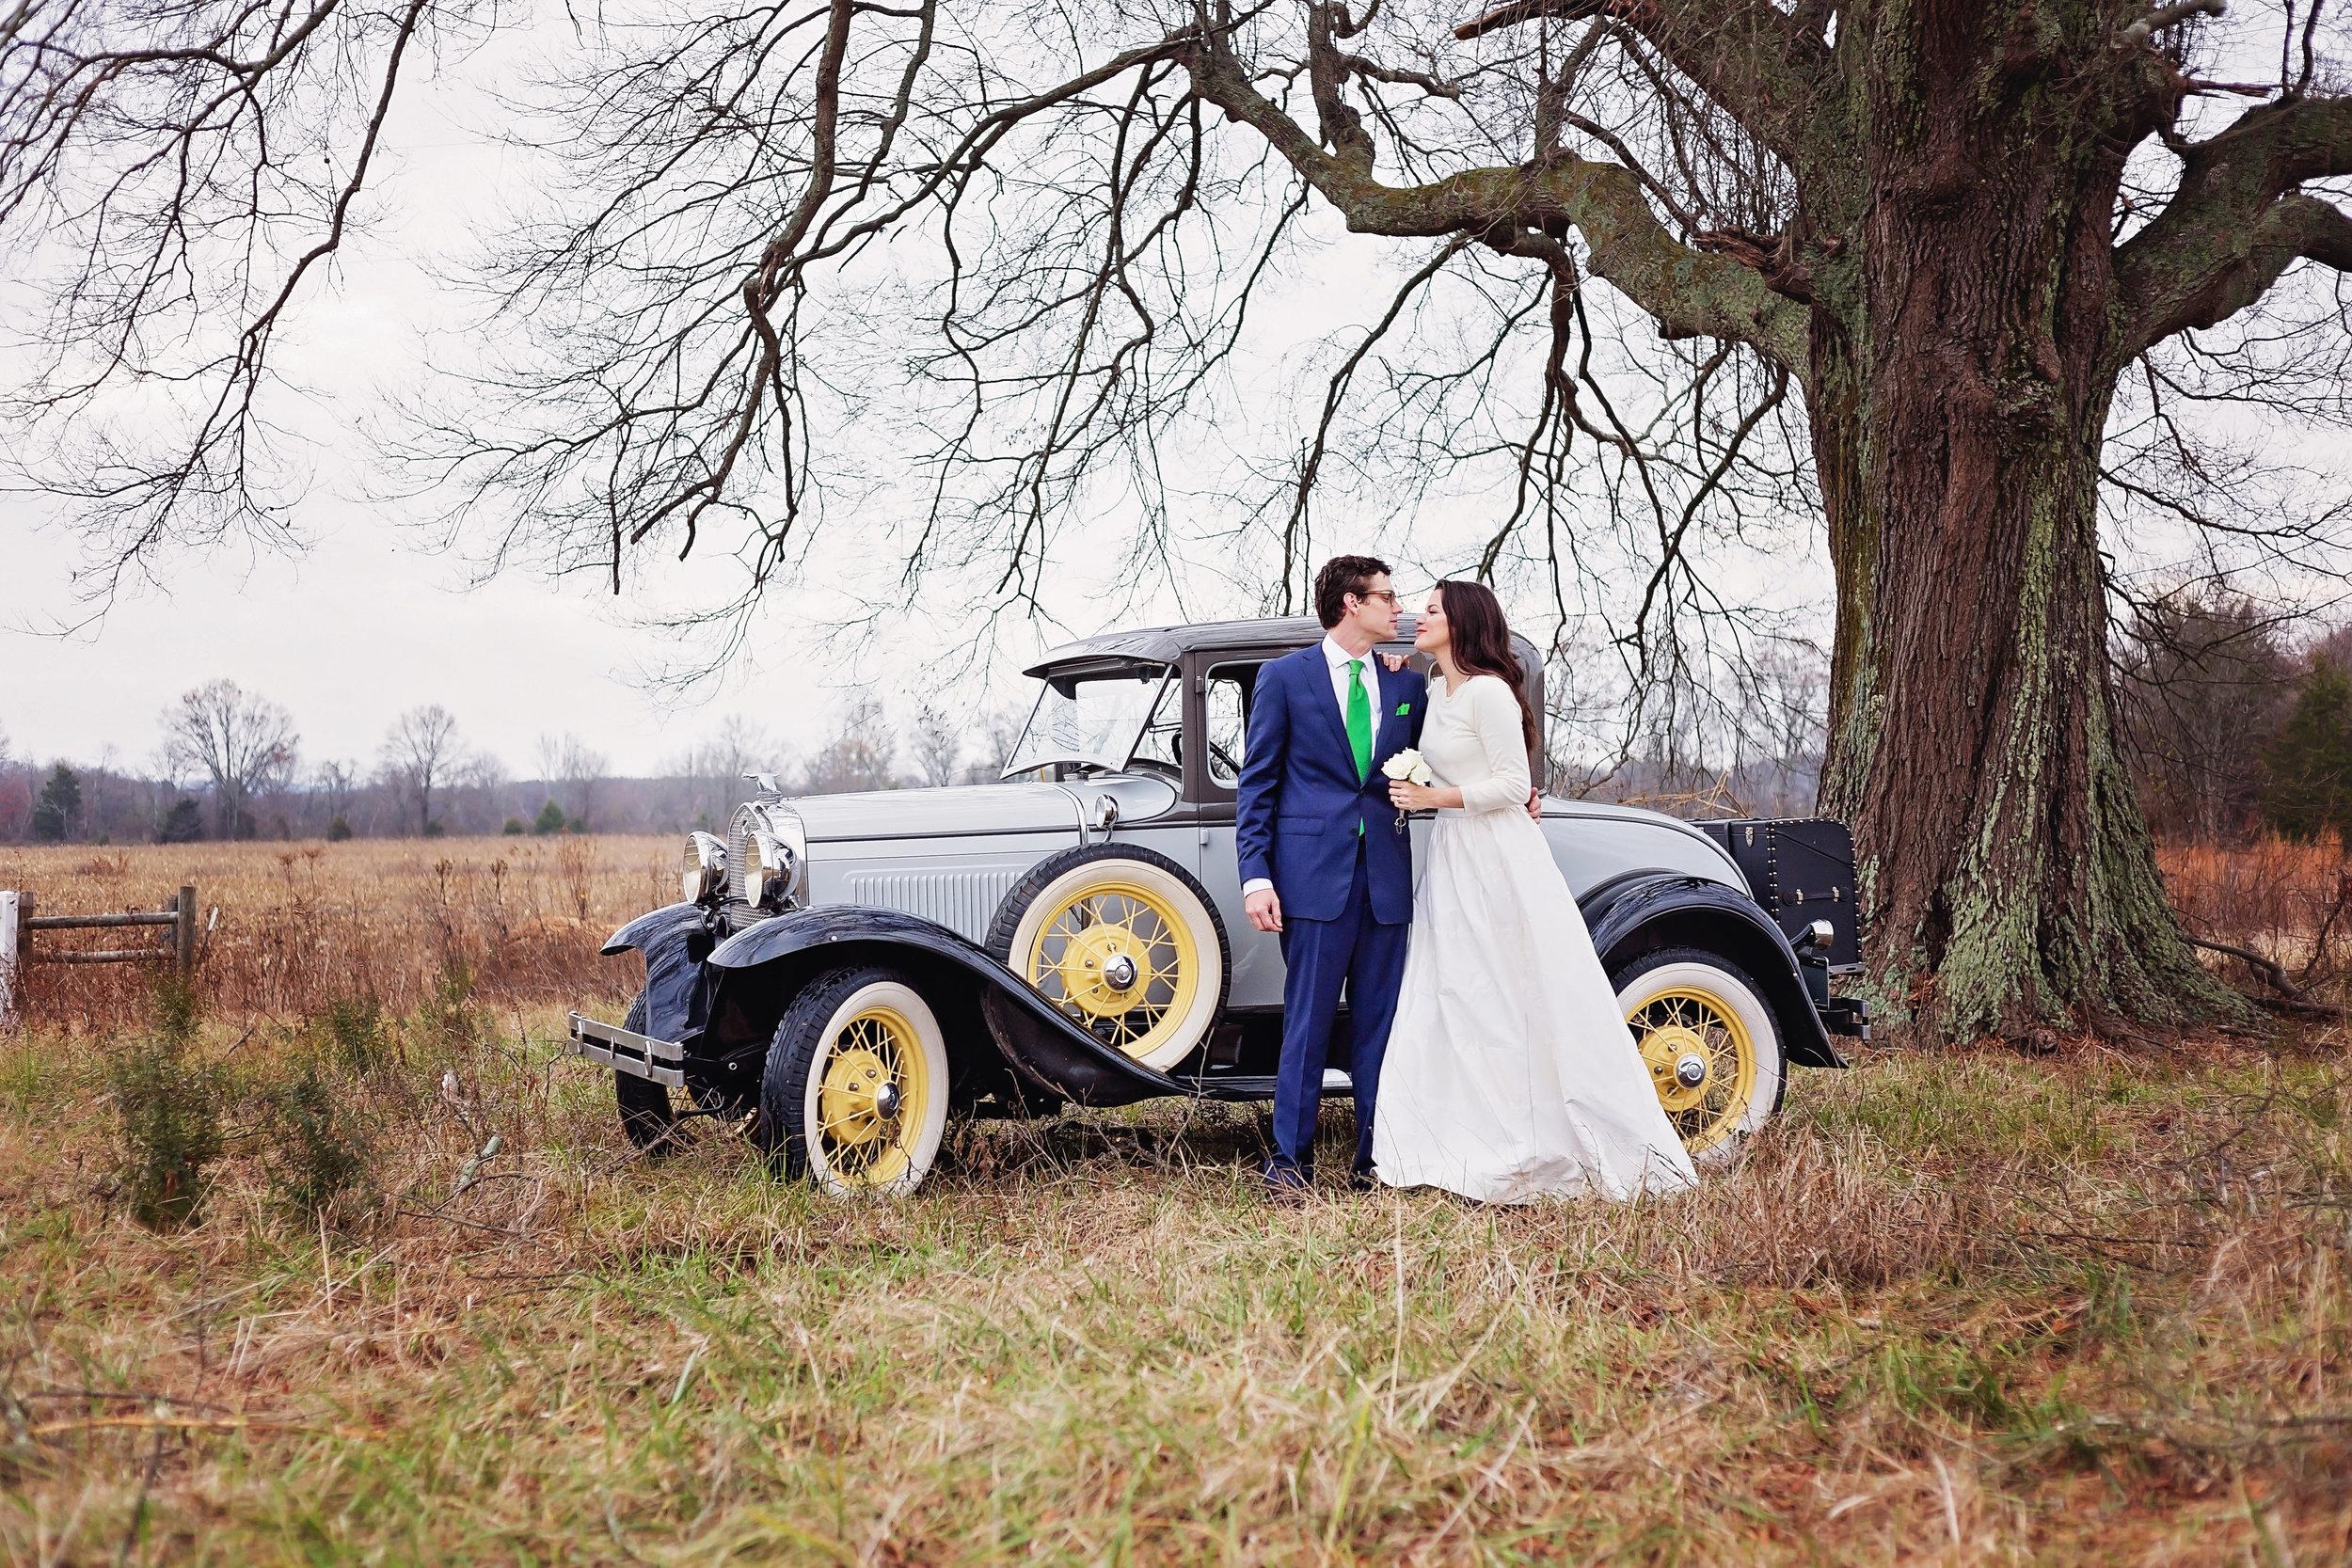 bride and groom antique car portrait